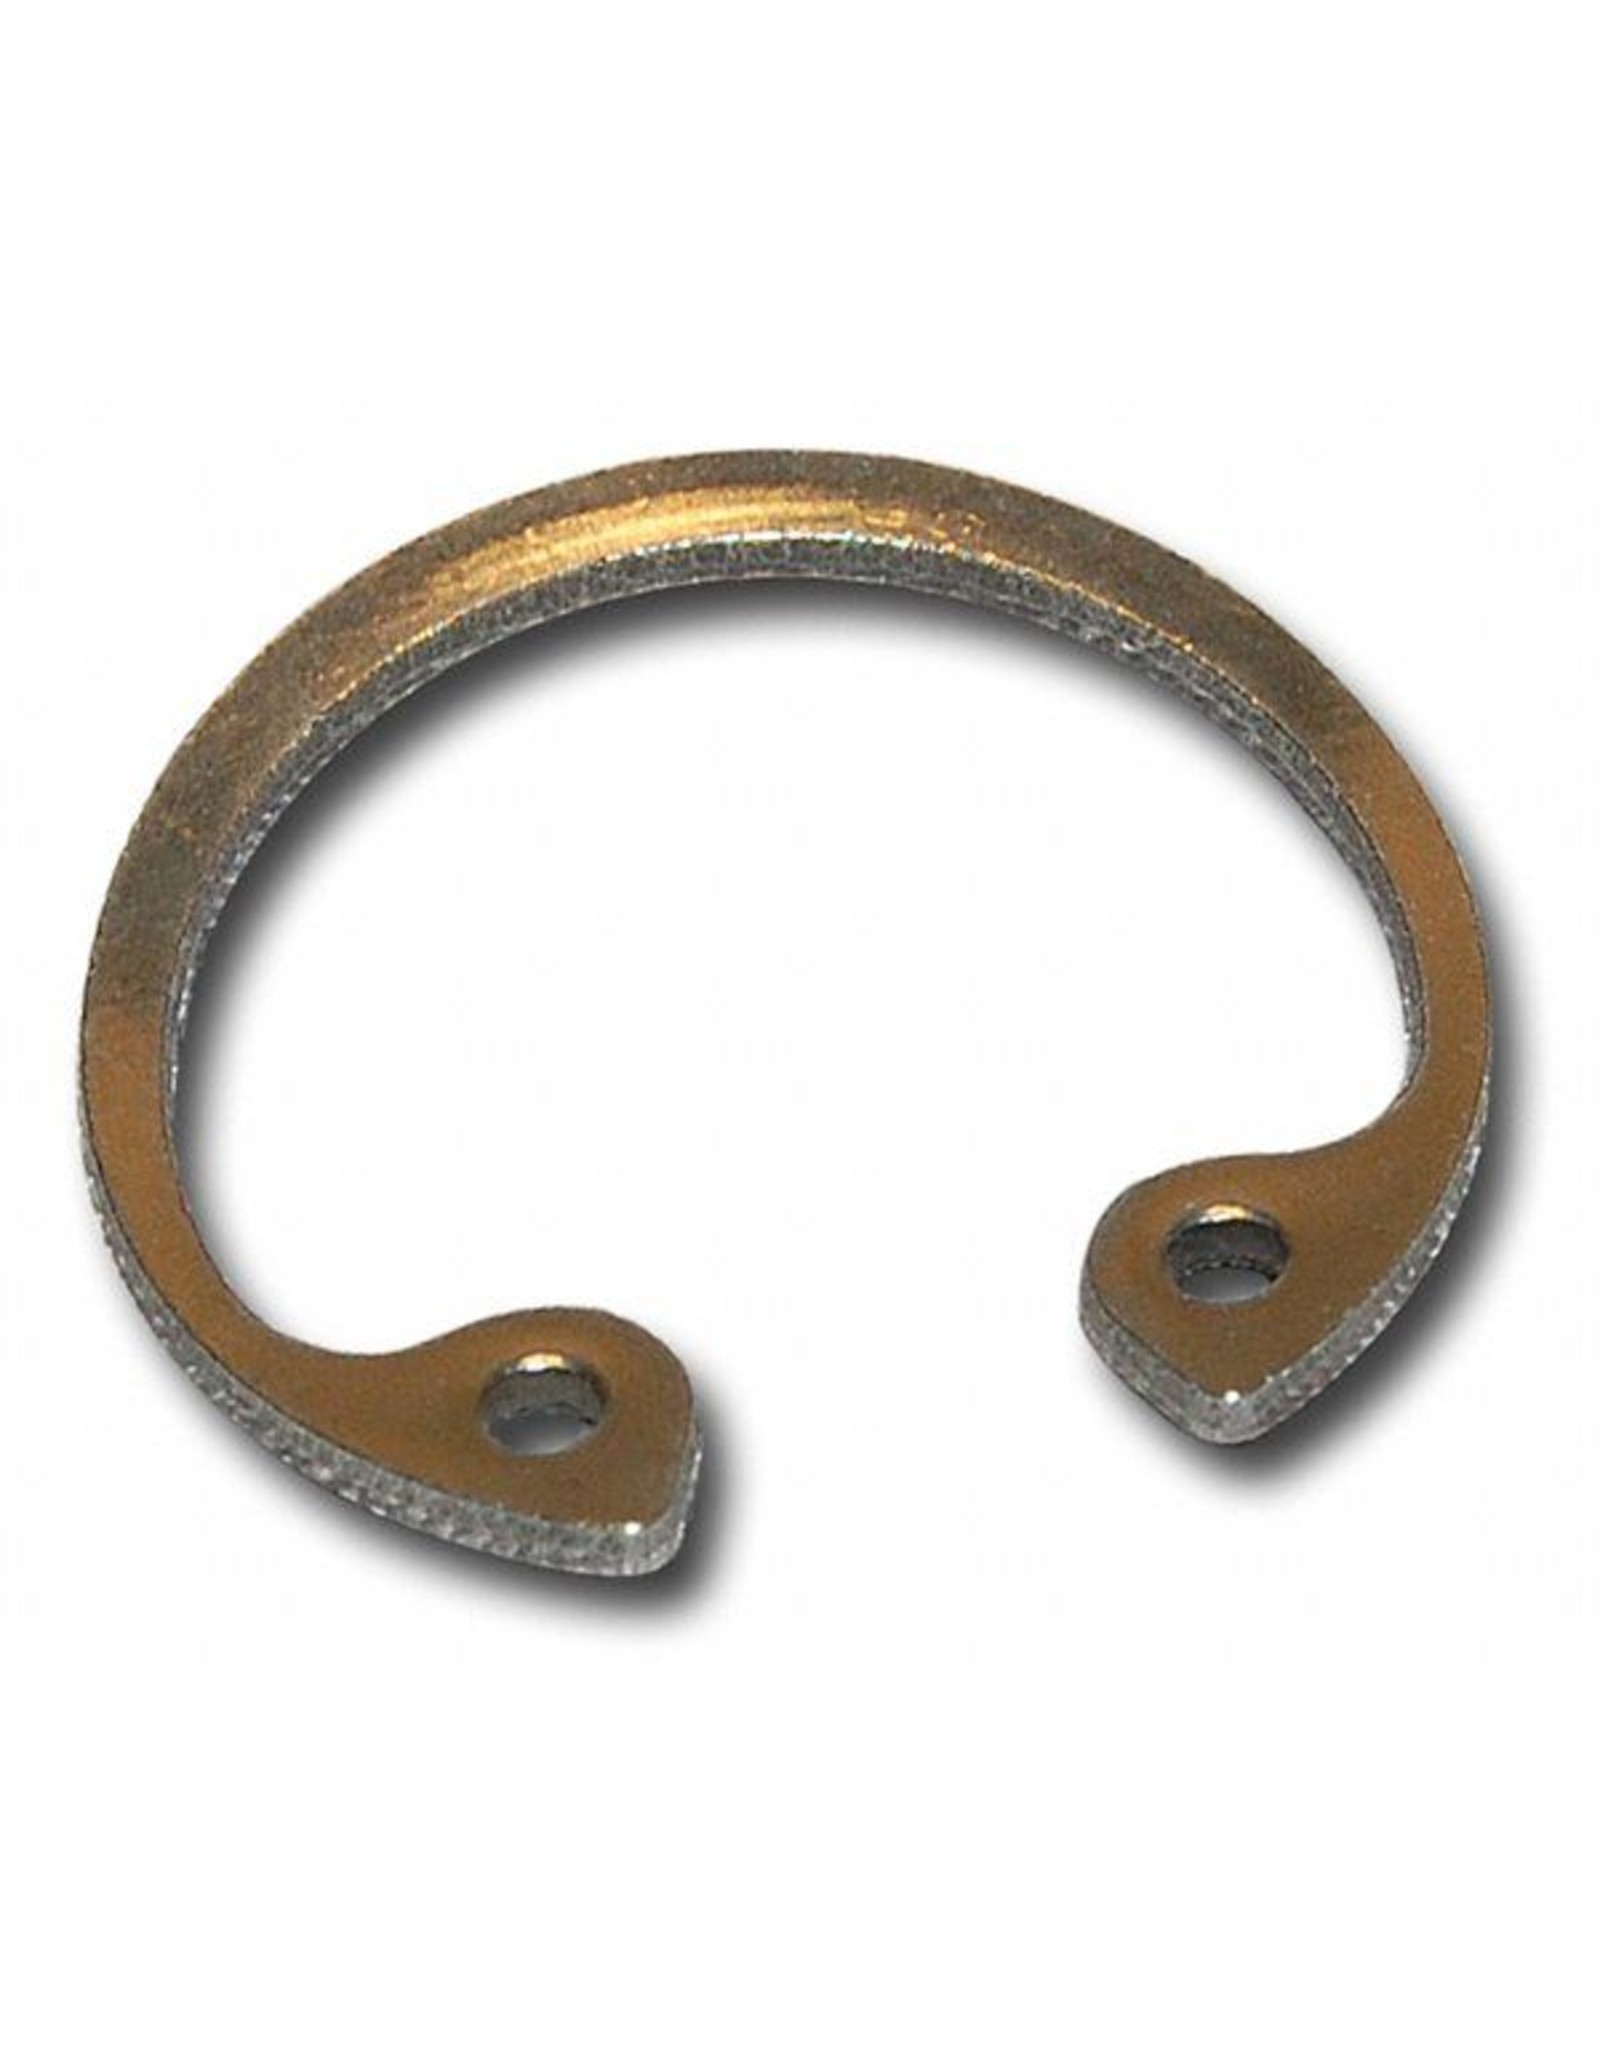 OMAX Style Snap Ring